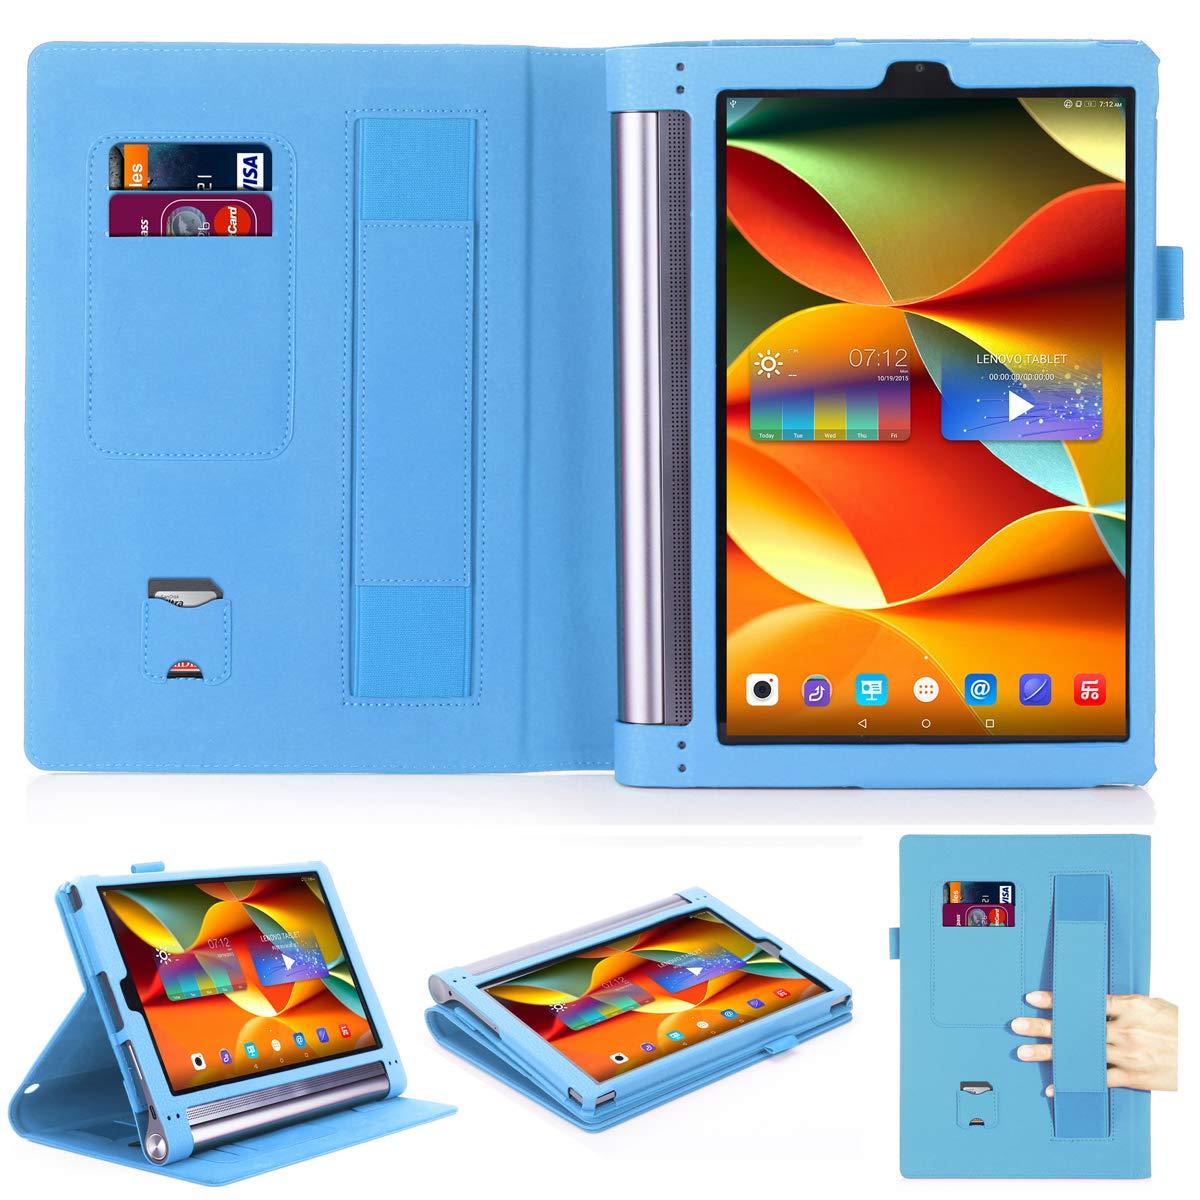 Tonycase - Funda para Tablet Lenovo Yoga Tab 3 Plus y Lenovo Yoga Tab 3 Pro 10 X90F YT3-X703F de 10,1